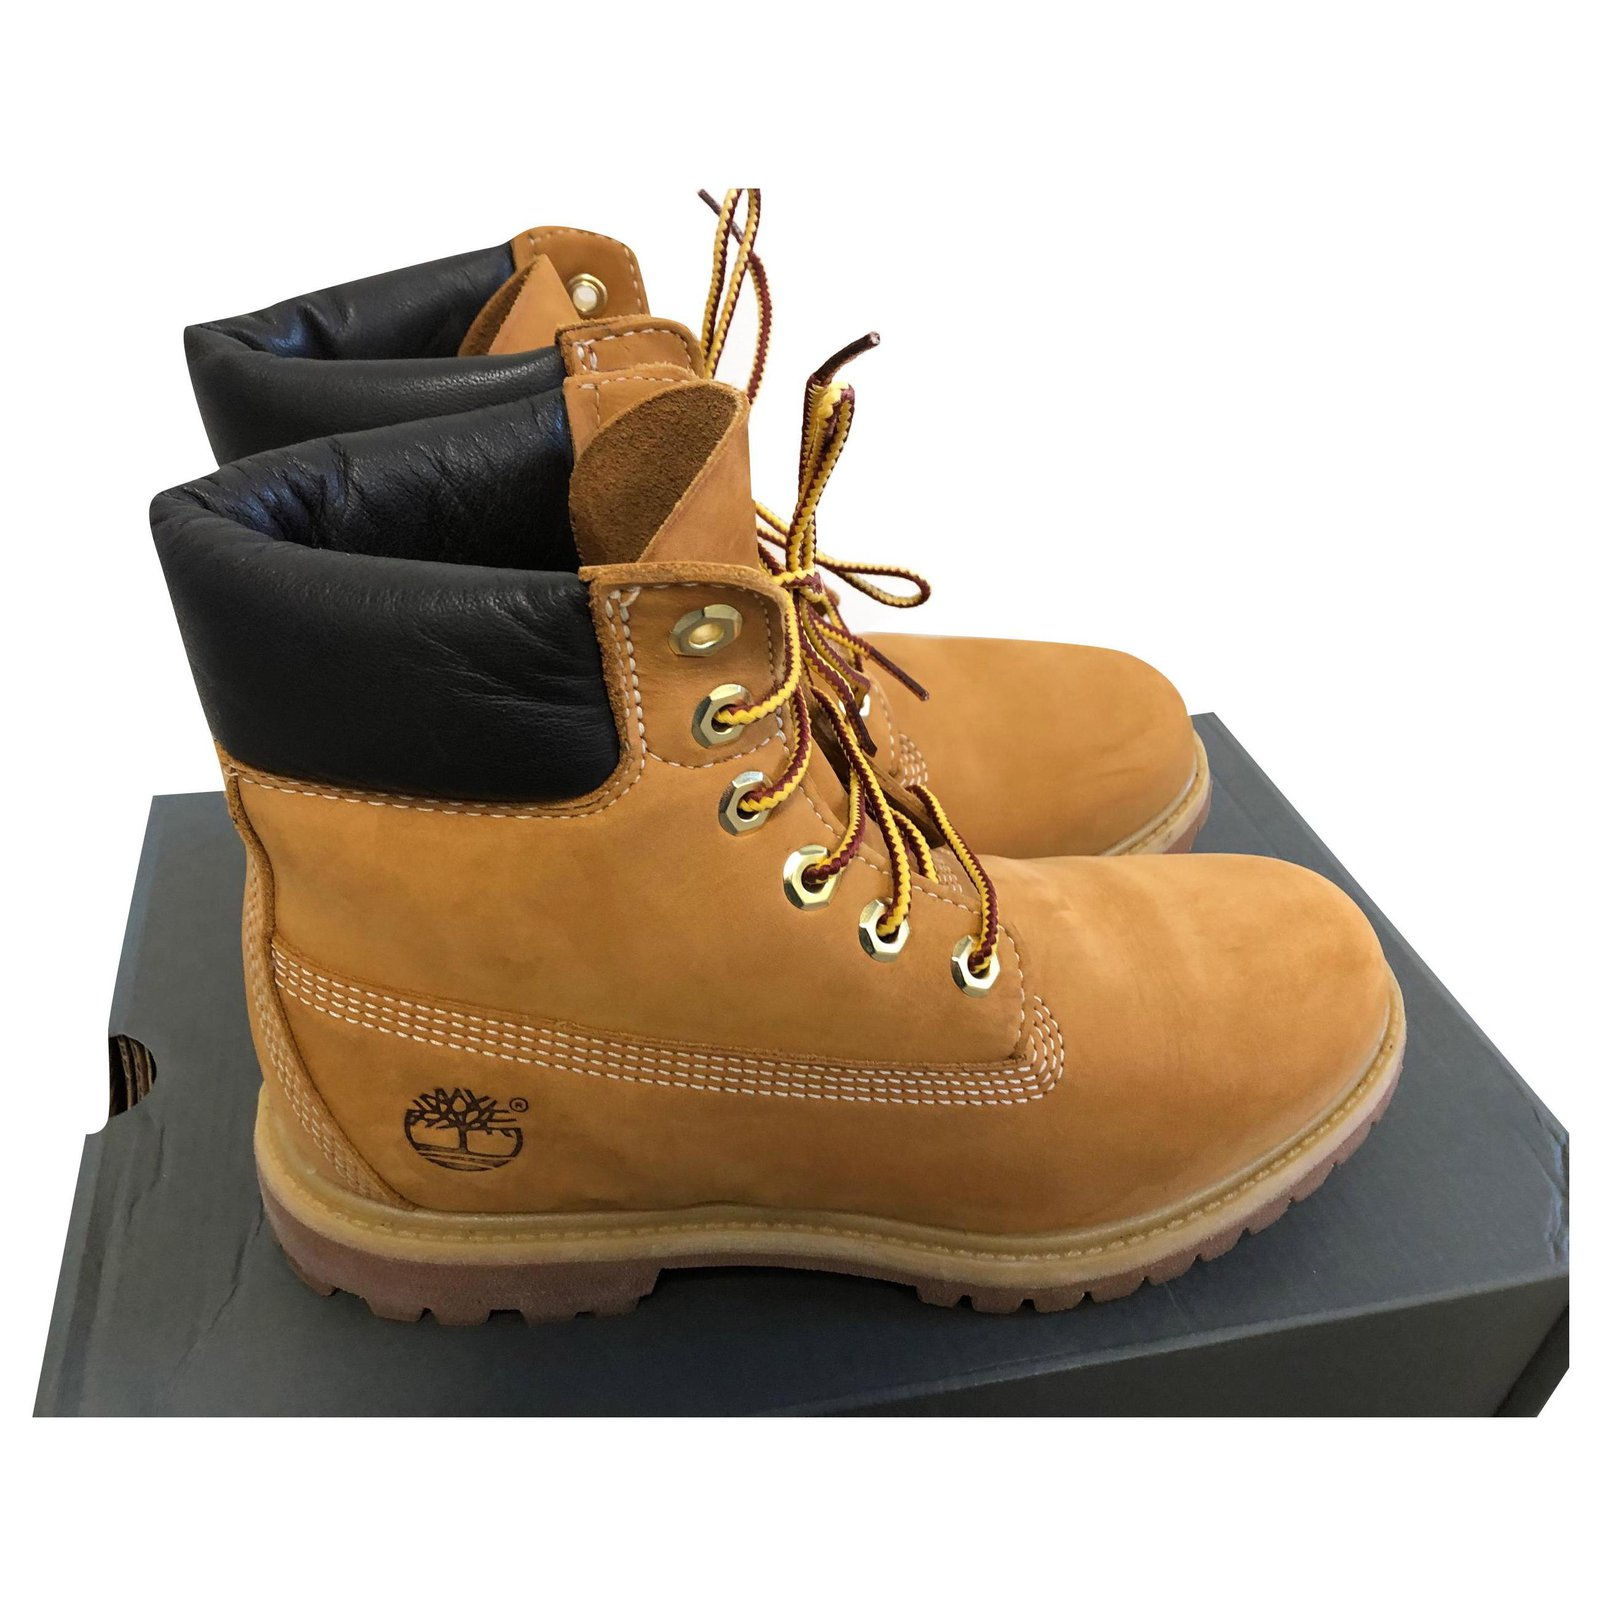 exposición crema fotografía  Timberland Ankle Boots Ankle Boots Nubuck Brown ref.167401 - Joli Closet